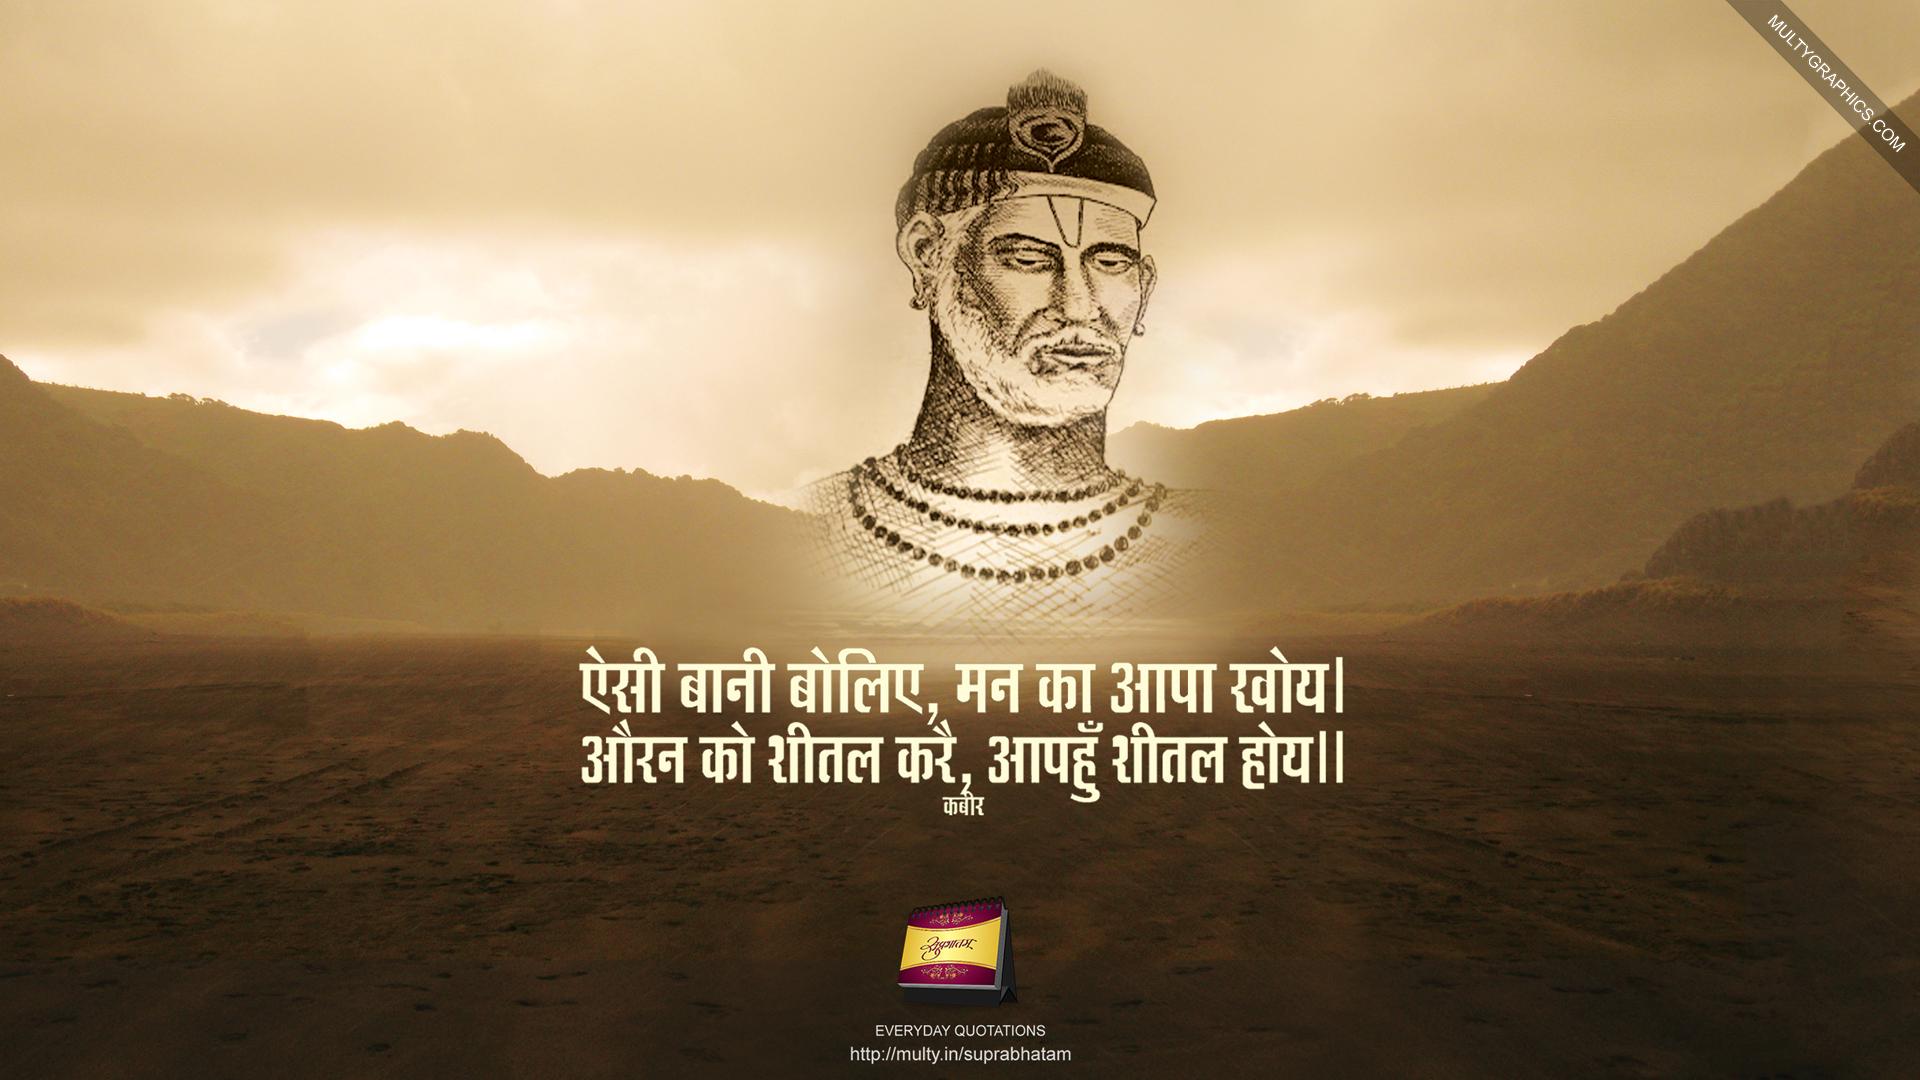 Motivational Quotes Hd Wallpaper Hindi - HD Wallpaper